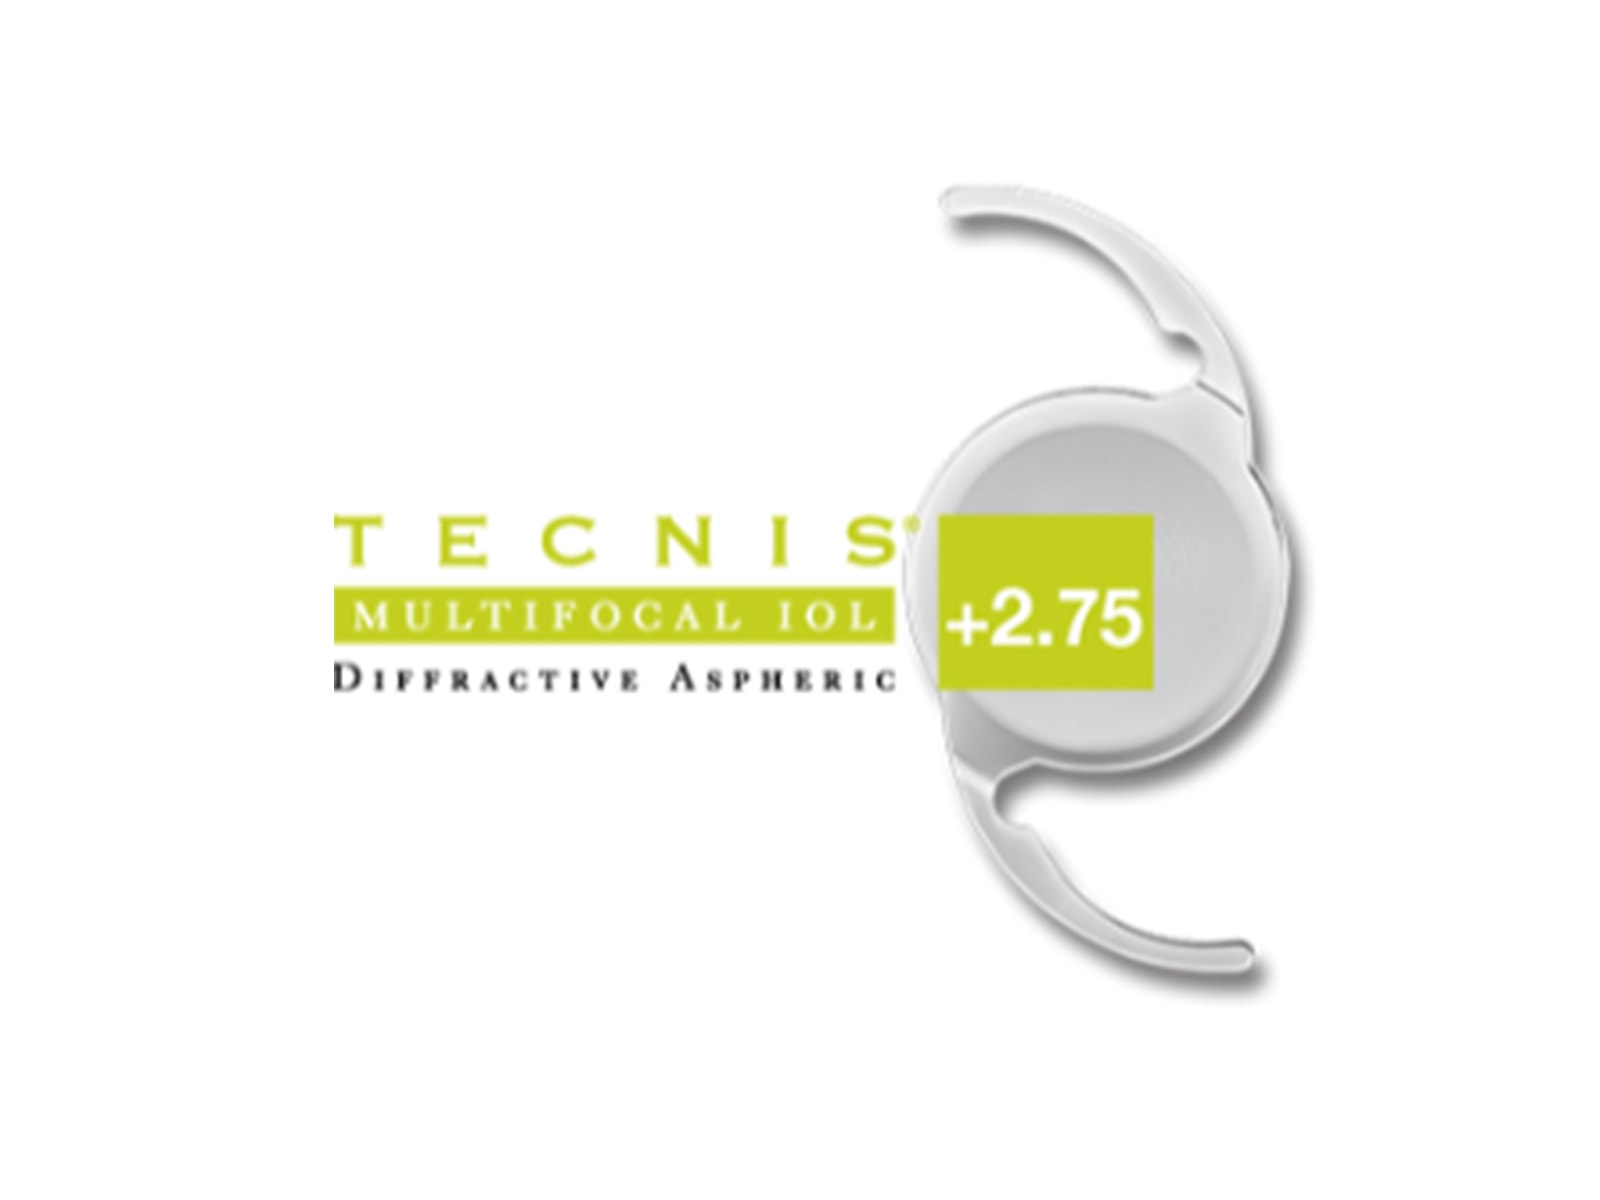 TECNIS Multifocal IOL +2.75 D